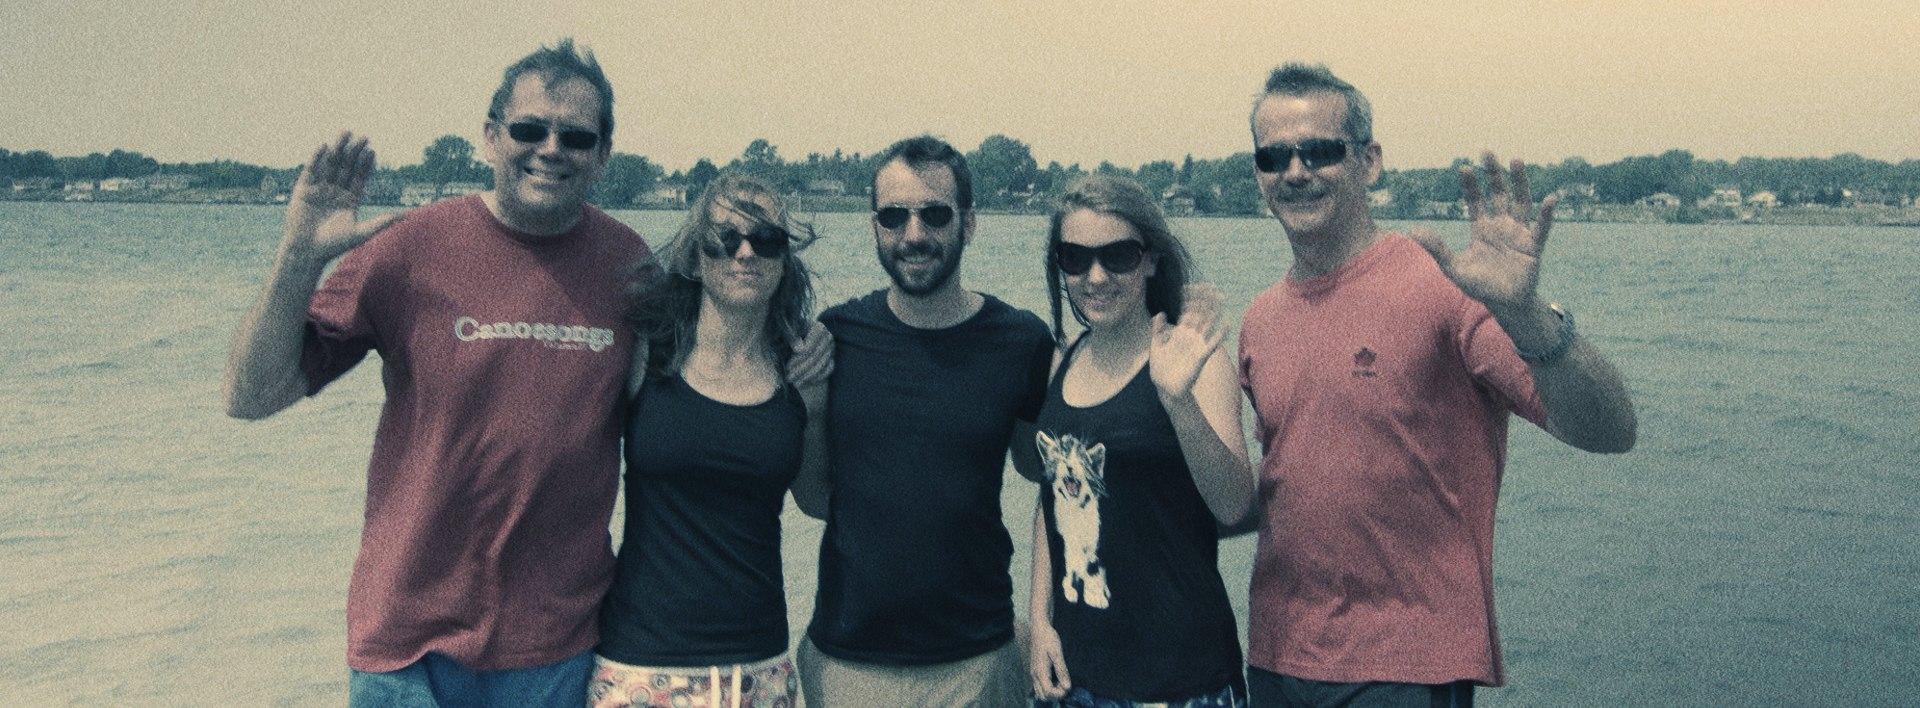 Hadfield_family.jpg